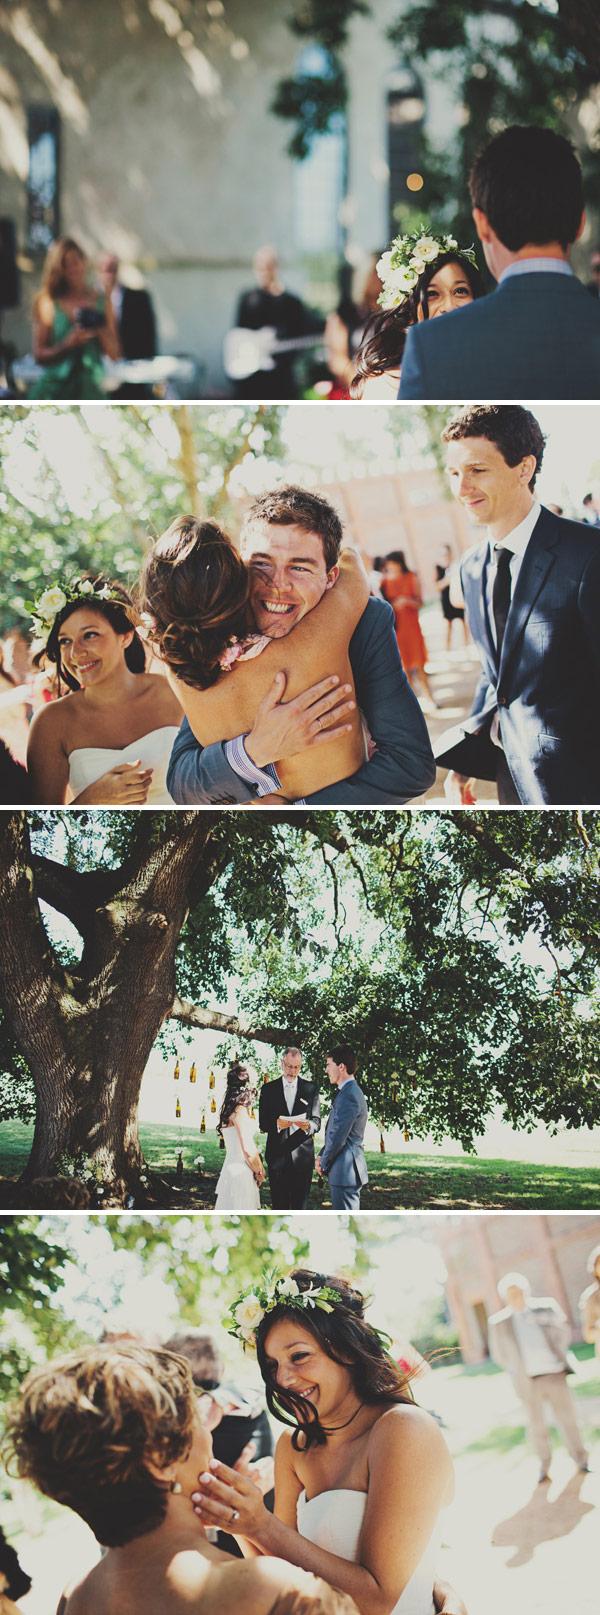 Australian Wedding Gifts For Overseas: An Australian Wedding With Jonathan Ong International